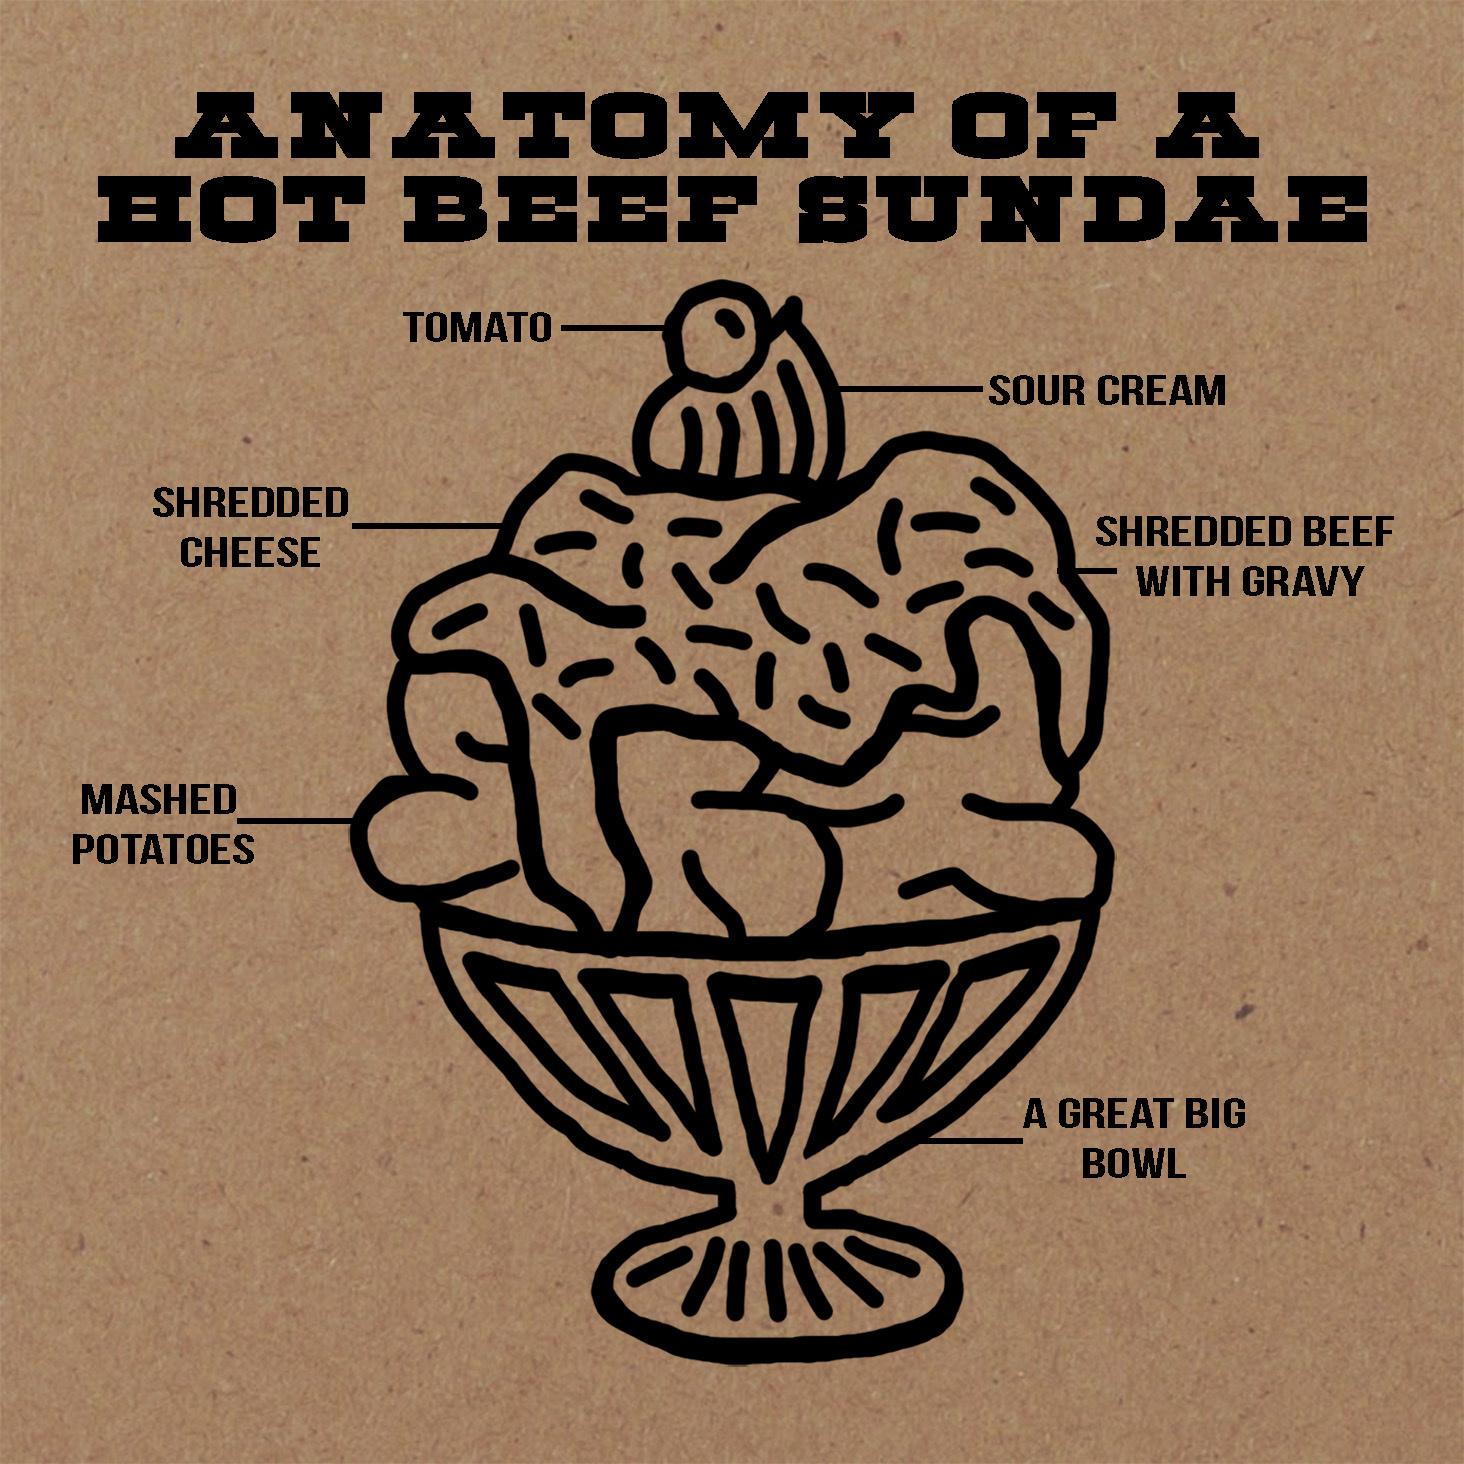 anatomy of a hot beef sundae